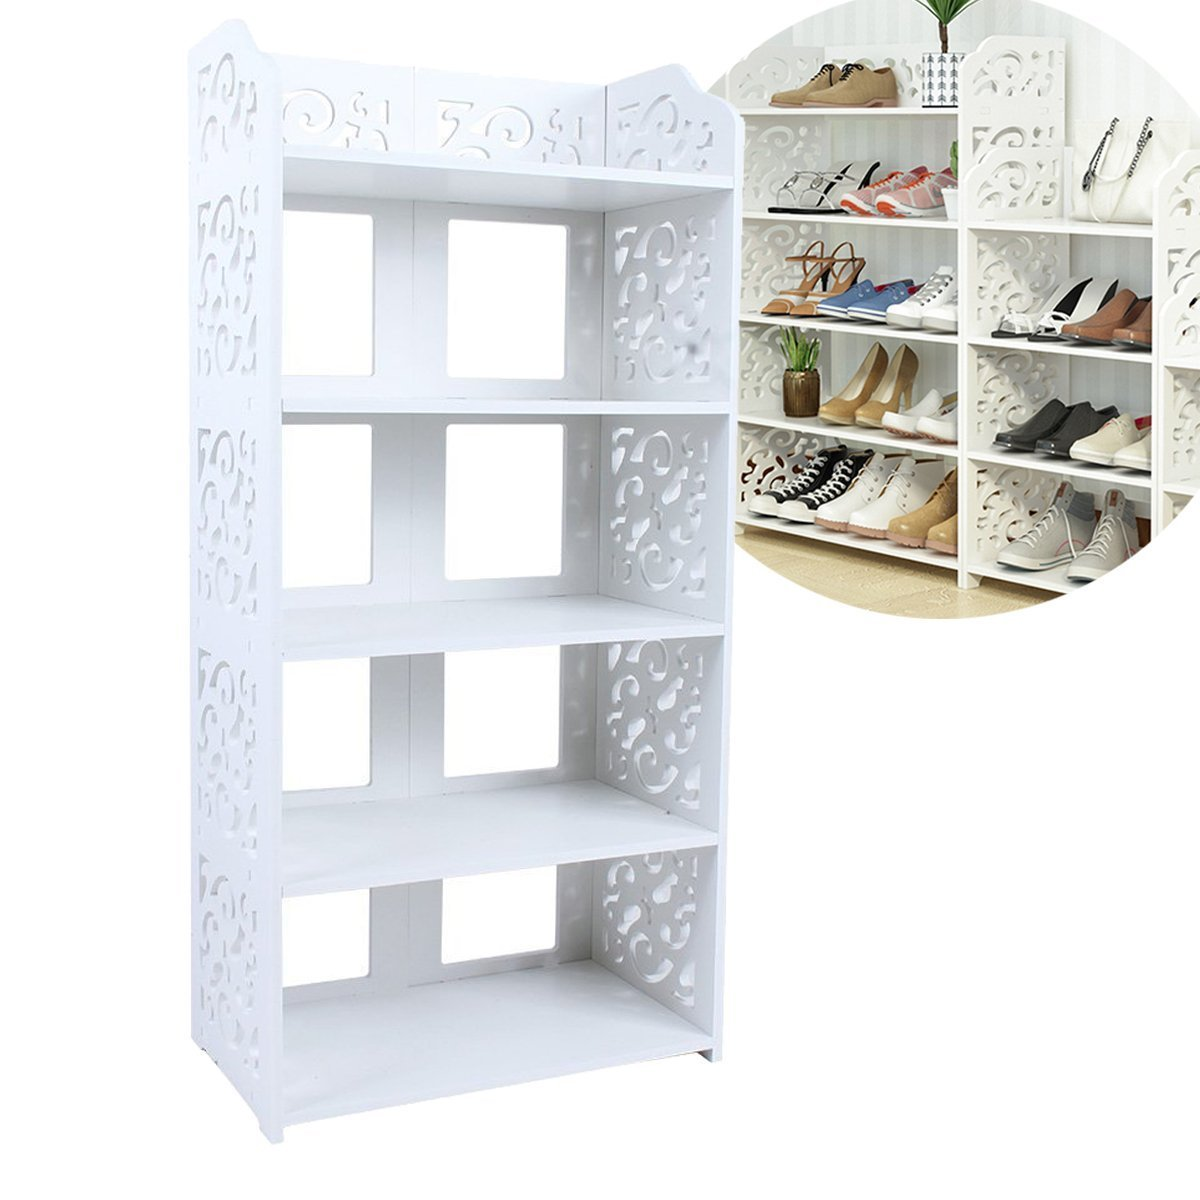 Estink 5-Tier Shoe Rack,Freestanding White Chic Hollow Out Shoe Tower Organizer Cabinet Shoe Closet Baroque Storage Organizer Stand Shelf Holder Unit Shelves,15.74'' x 9.05'' x 35.43''